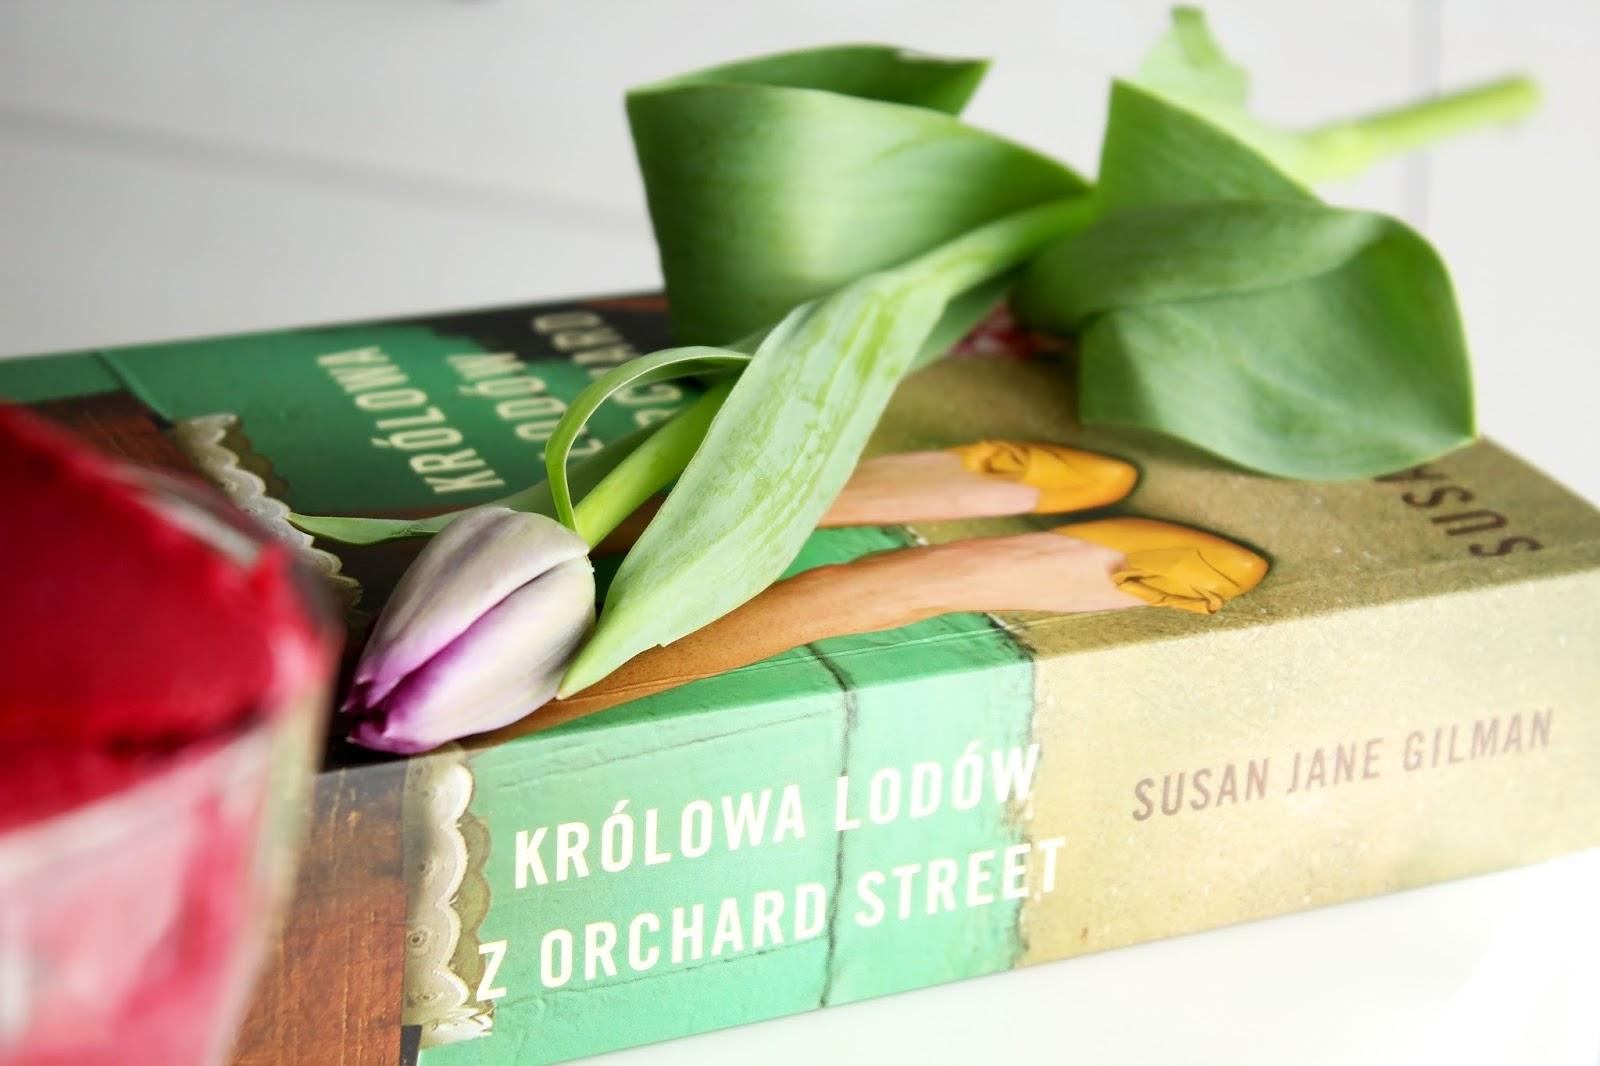 krolowa-lodow-z-orchard-street